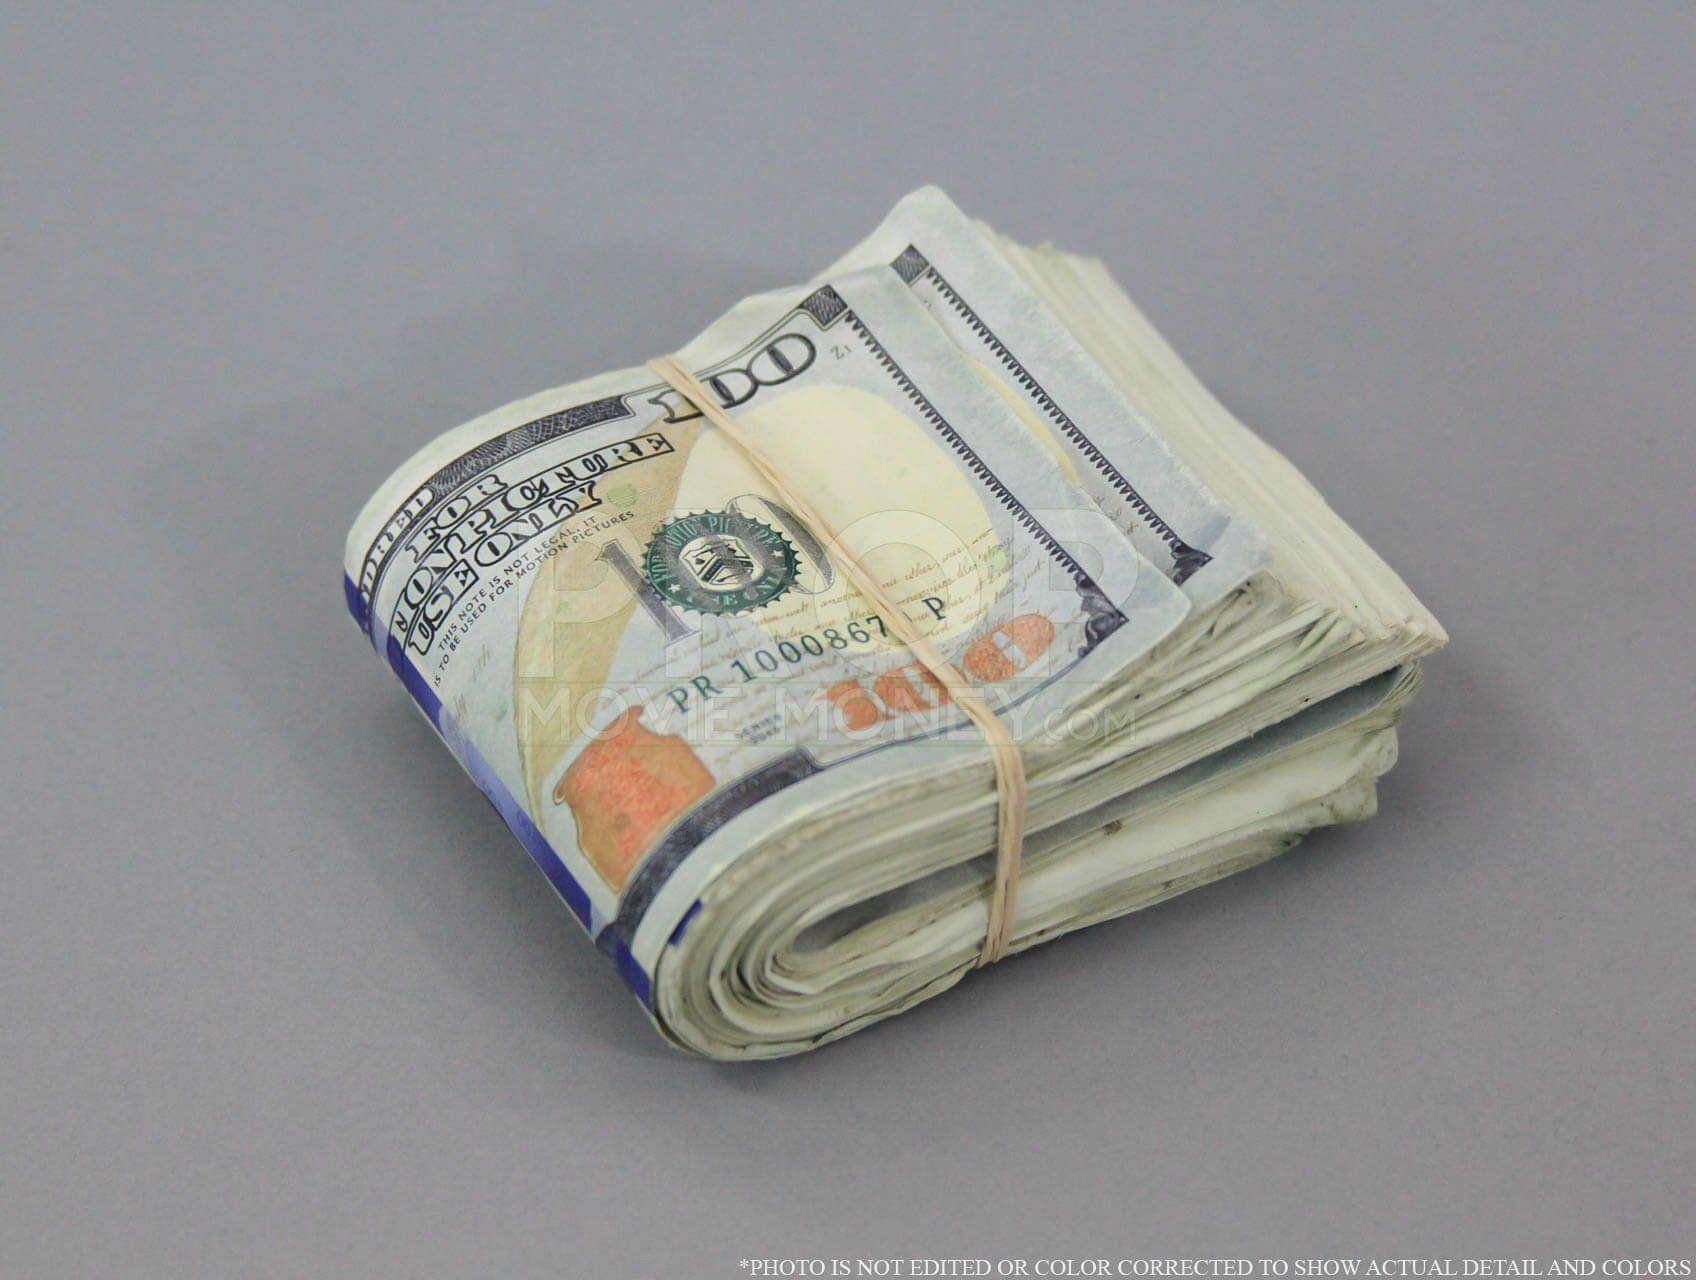 newstyle-100s-money-fold-wad-main-money